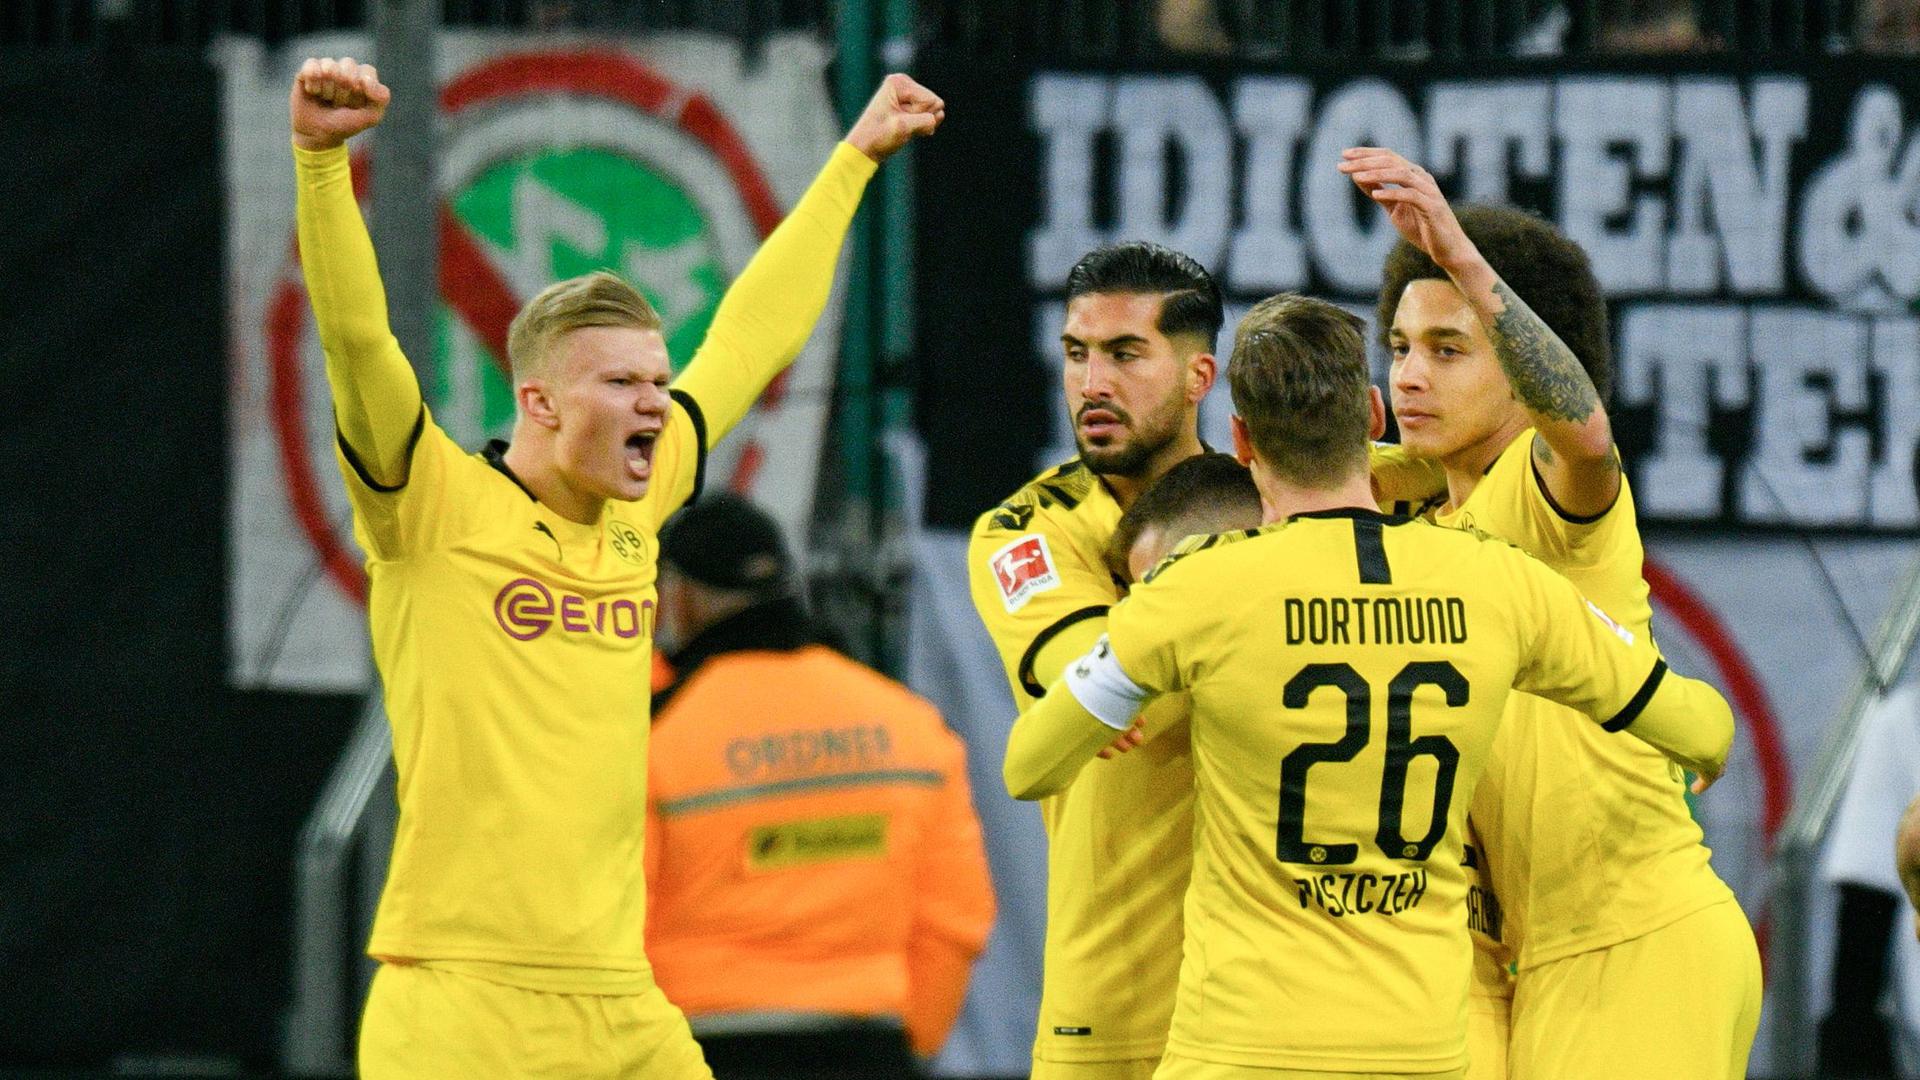 Gehalt Borussia Dortmund